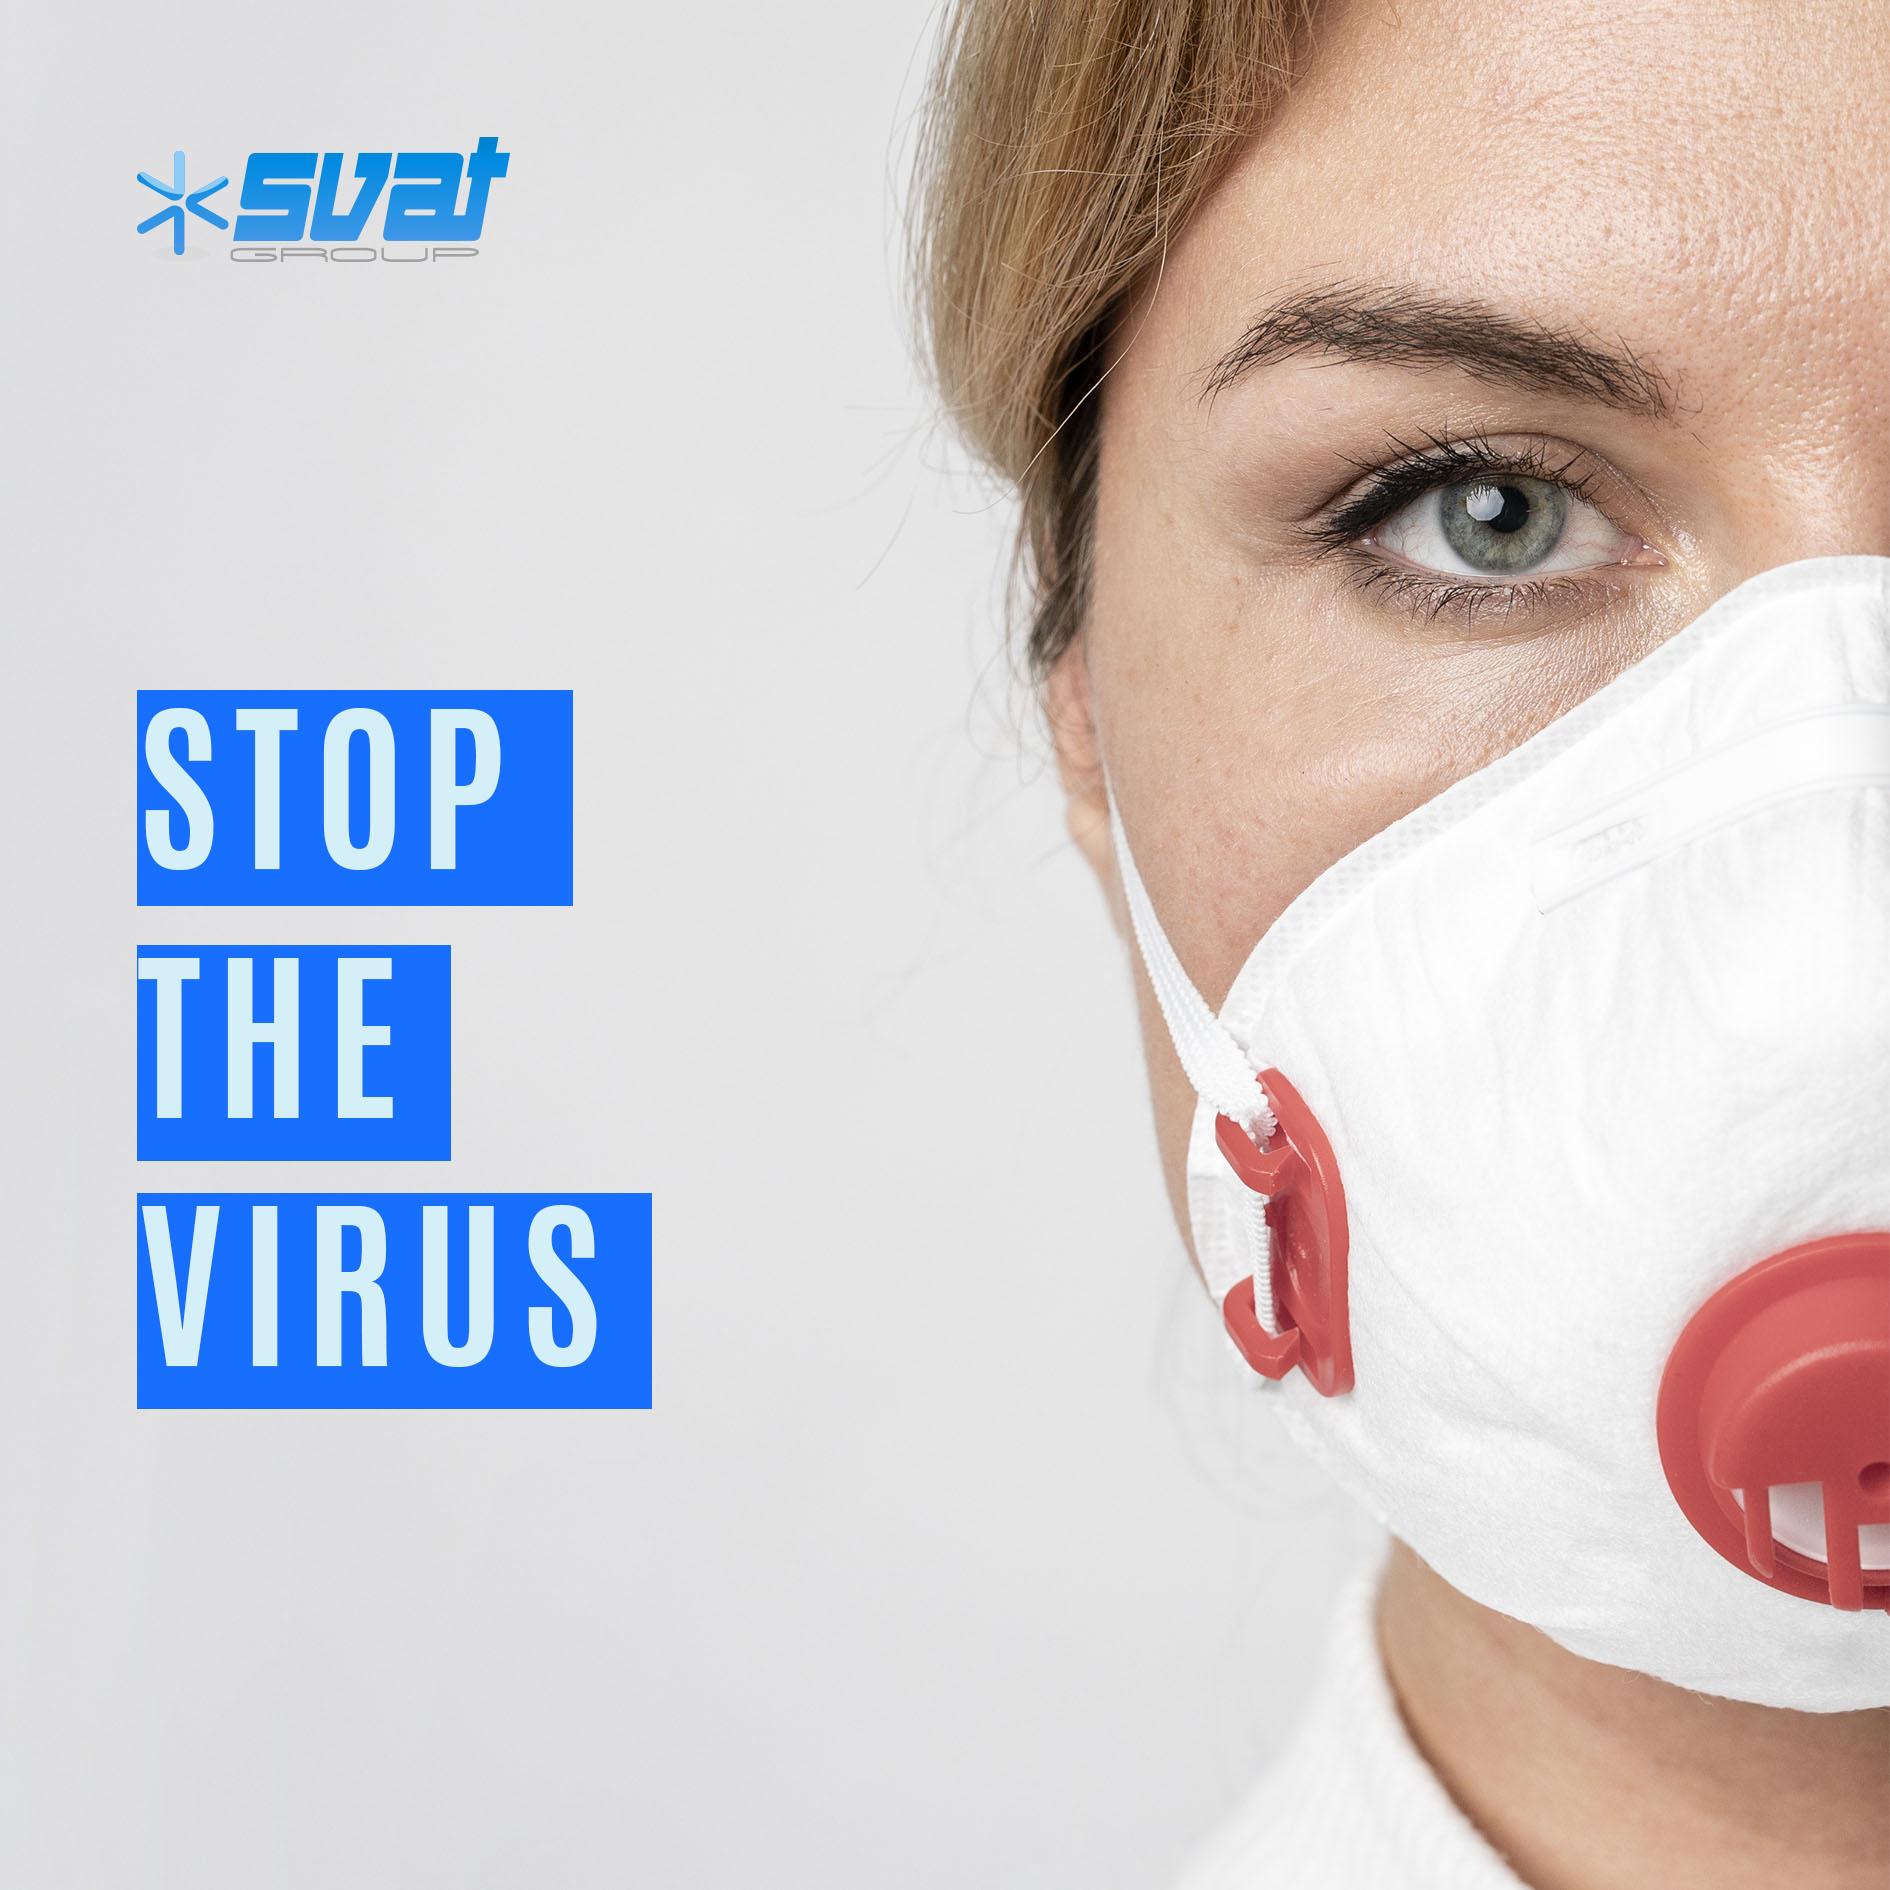 stop-the-virus